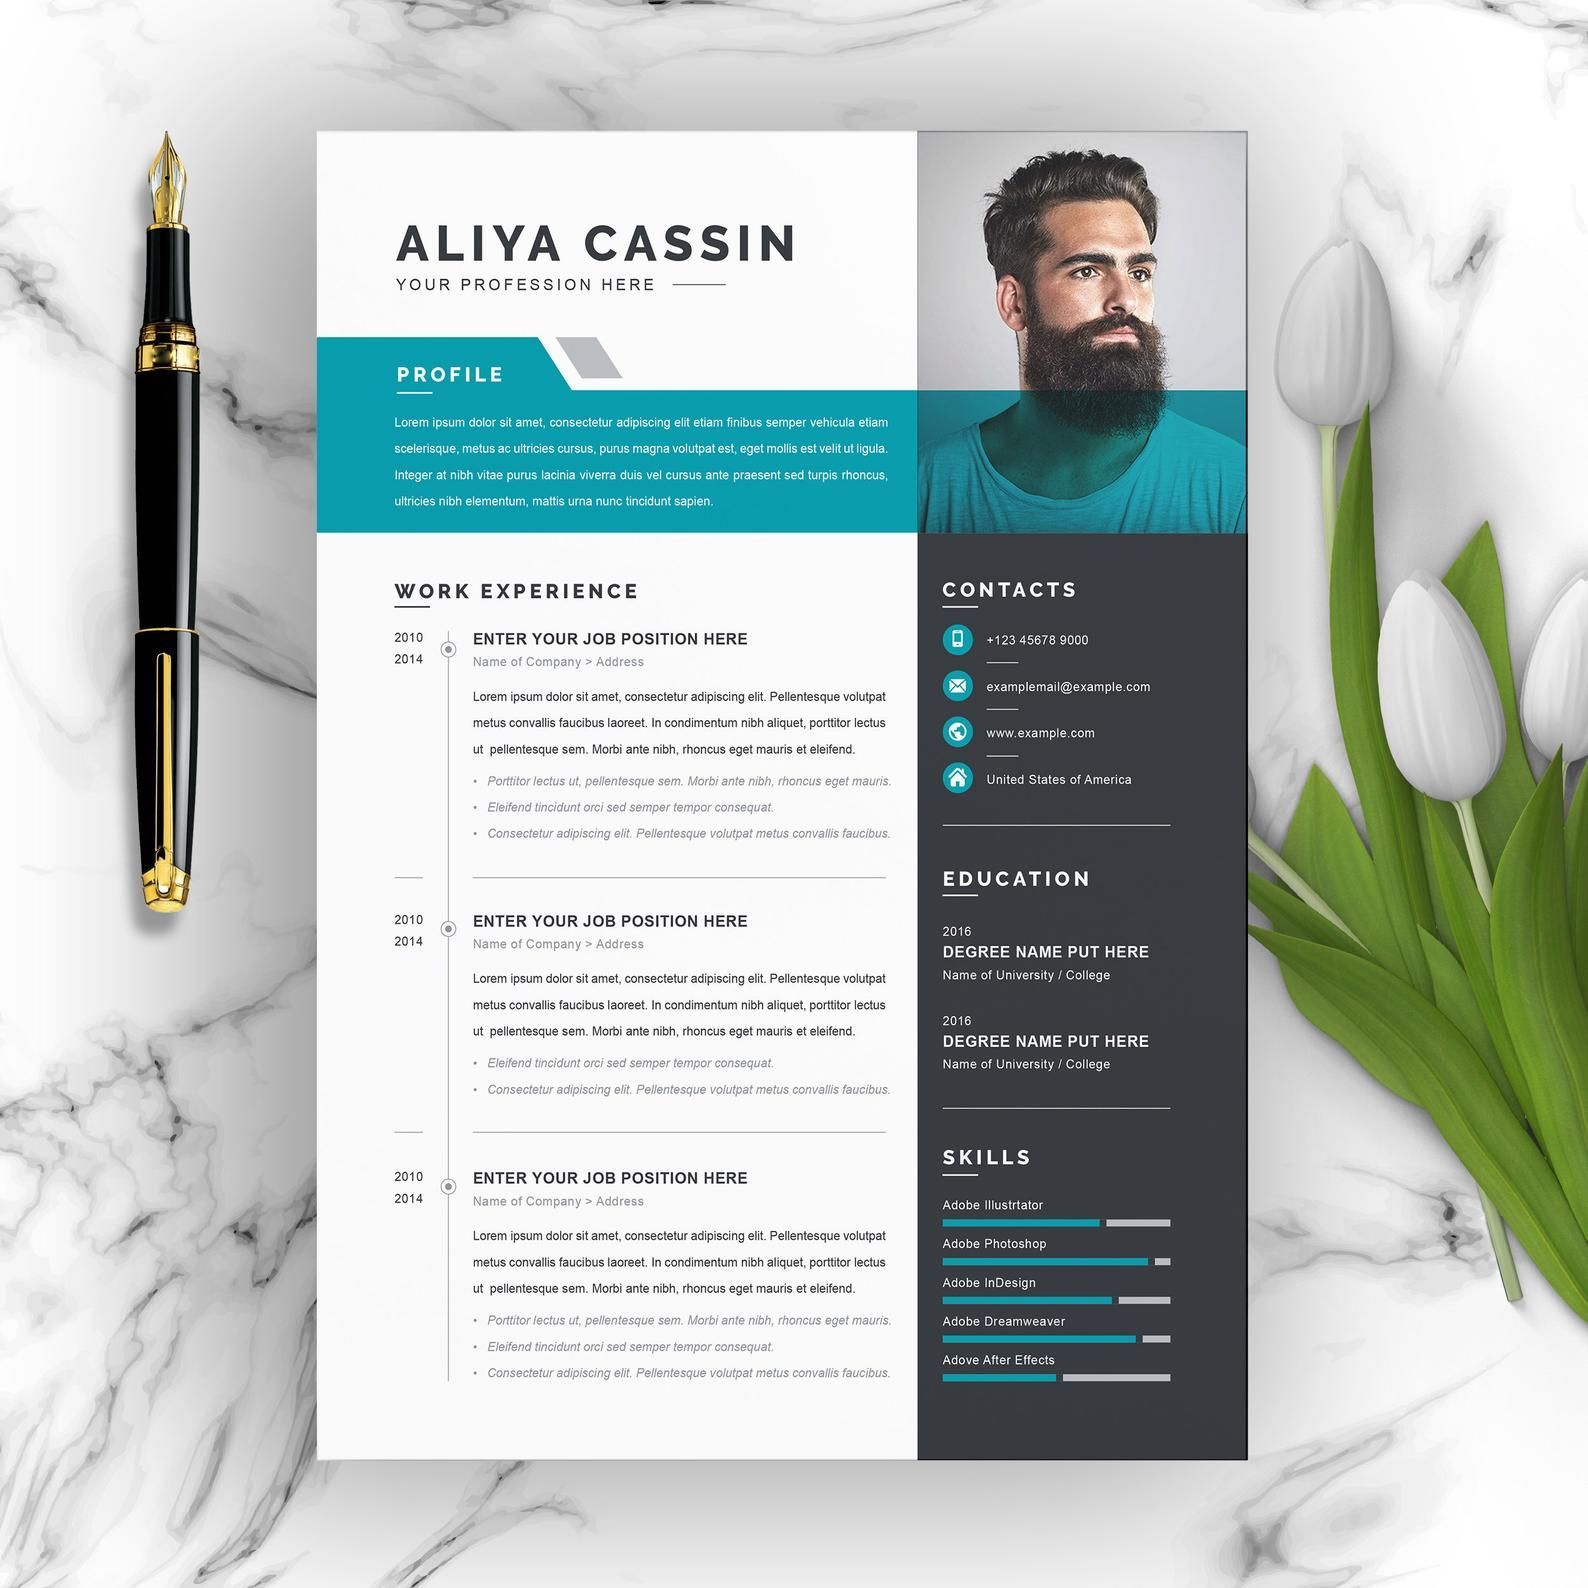 Professional Resume Cv Template With Ms Word Cover Letter Etsy Desain Resume Desain Cv Desain